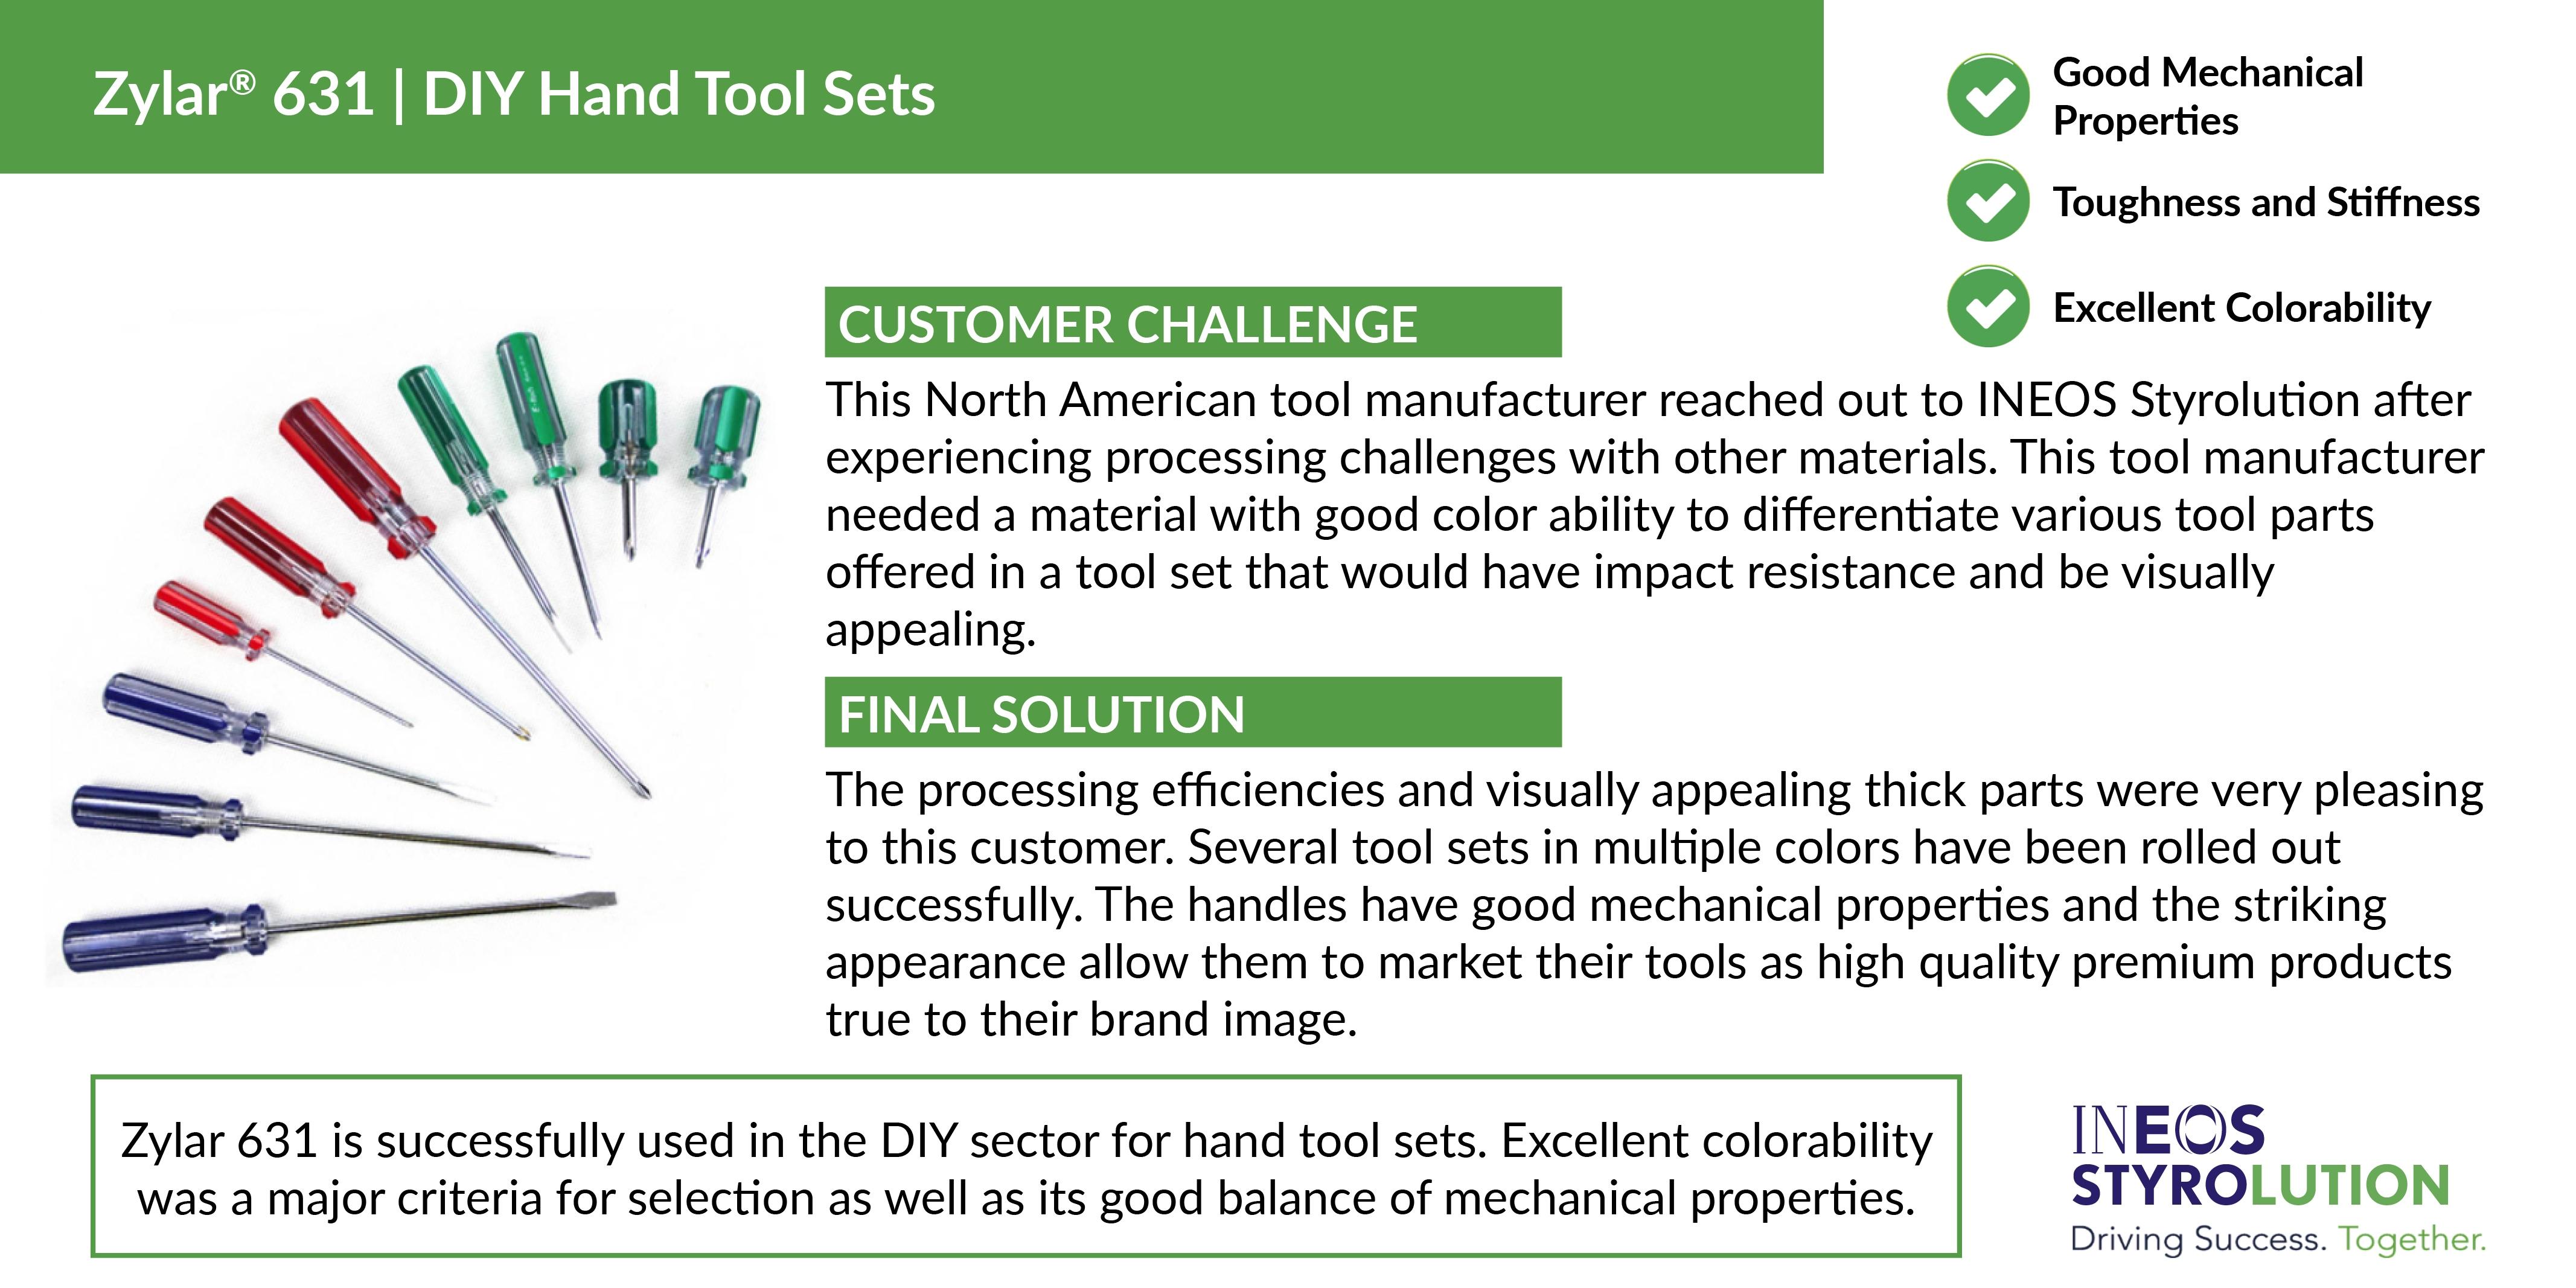 INEOS Case Study DIY Hand Tool Sets